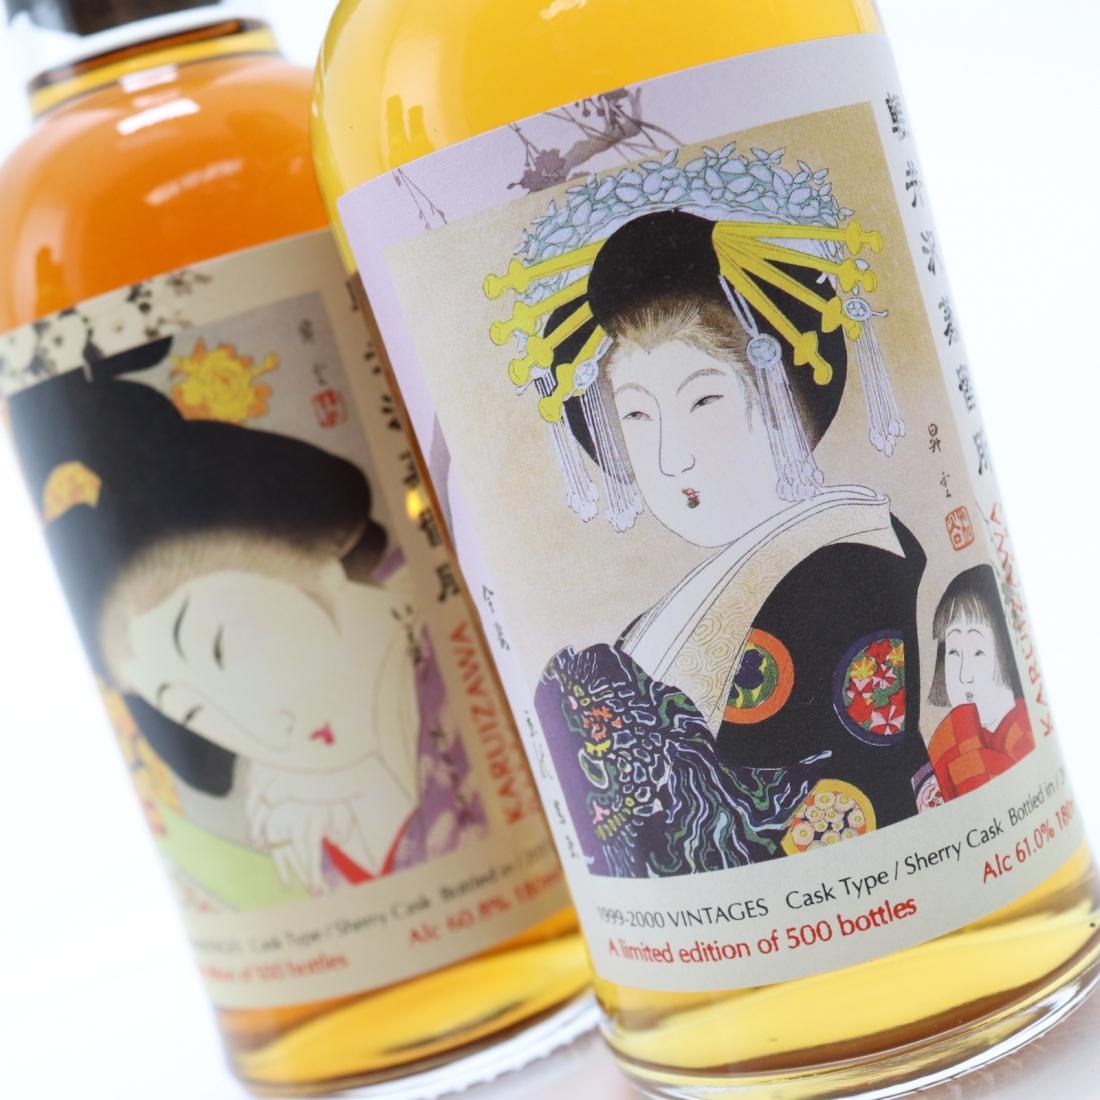 Karuizawa1999-2000 The Golden House of Five Mistress / 5 x 18cl